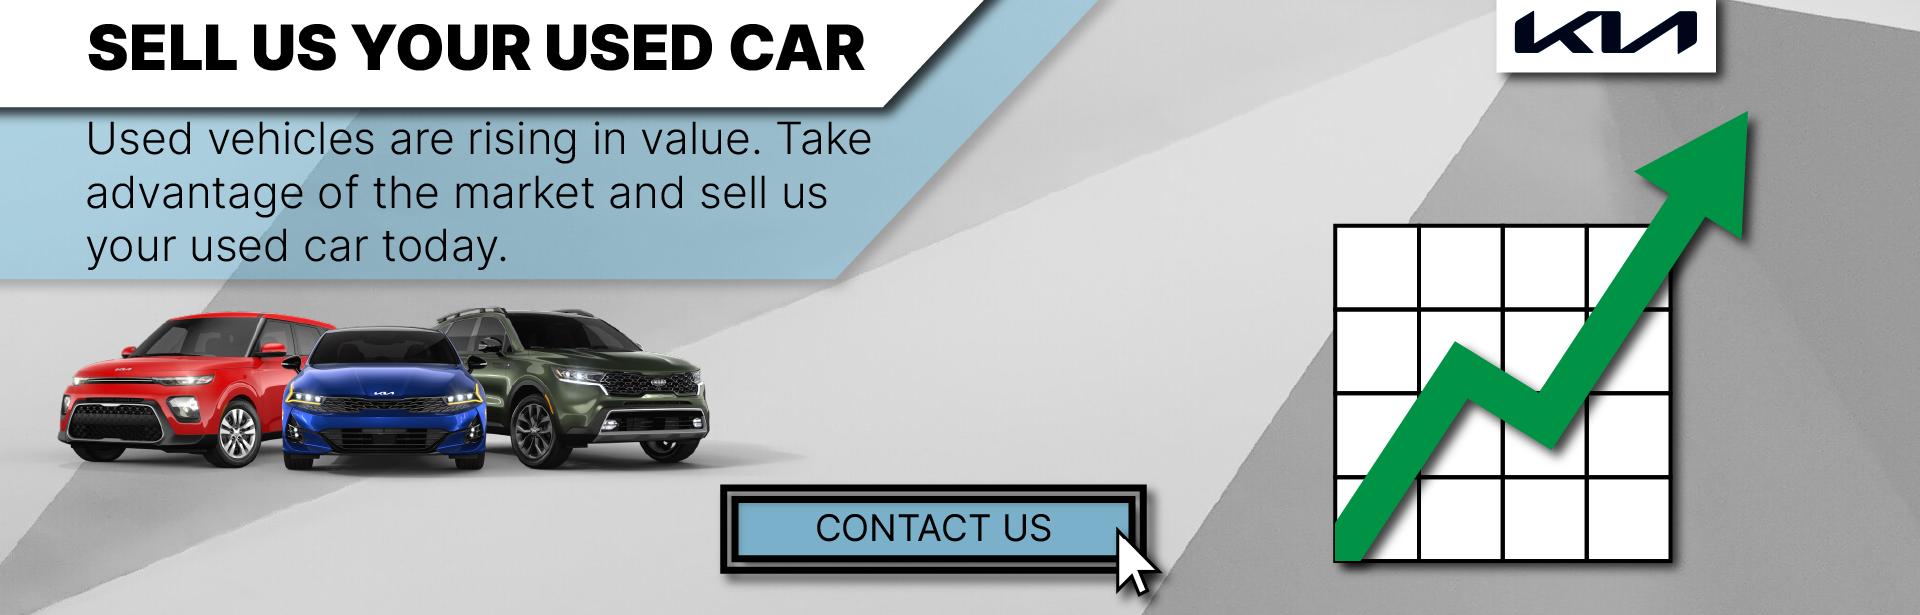 Celebration Kia Sell Your Vehicle Slide Final fixed